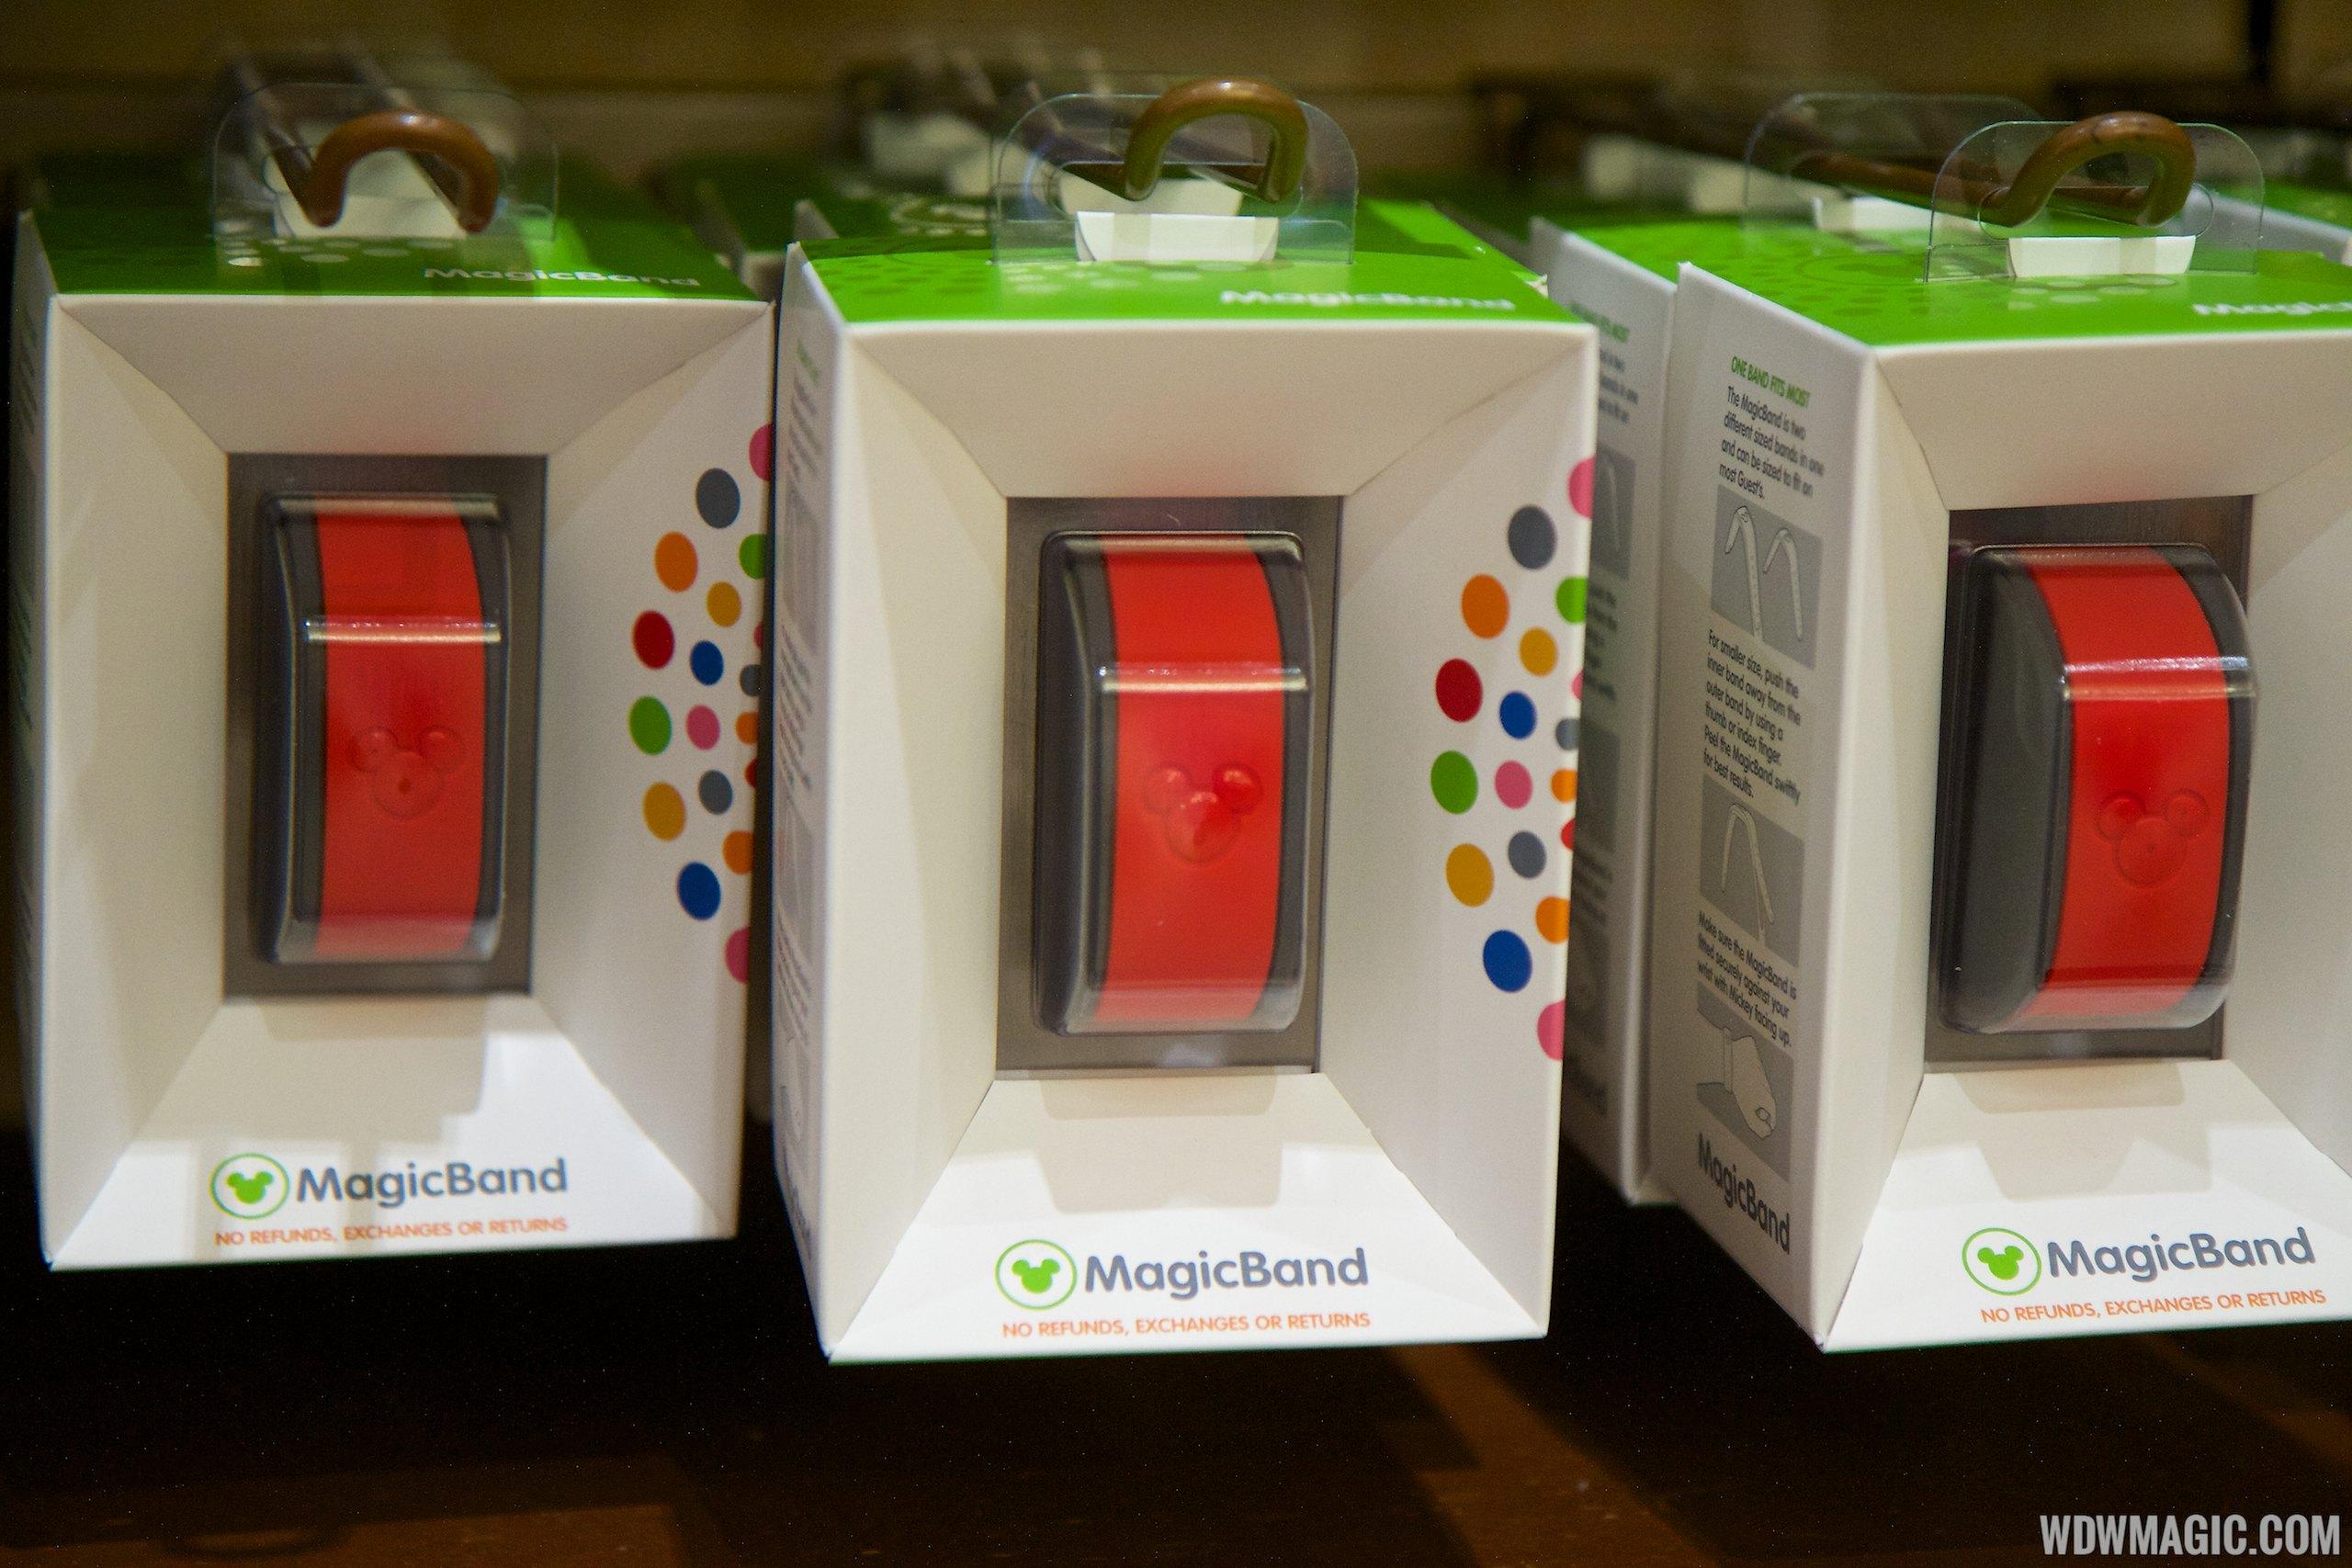 MagicBand retail display